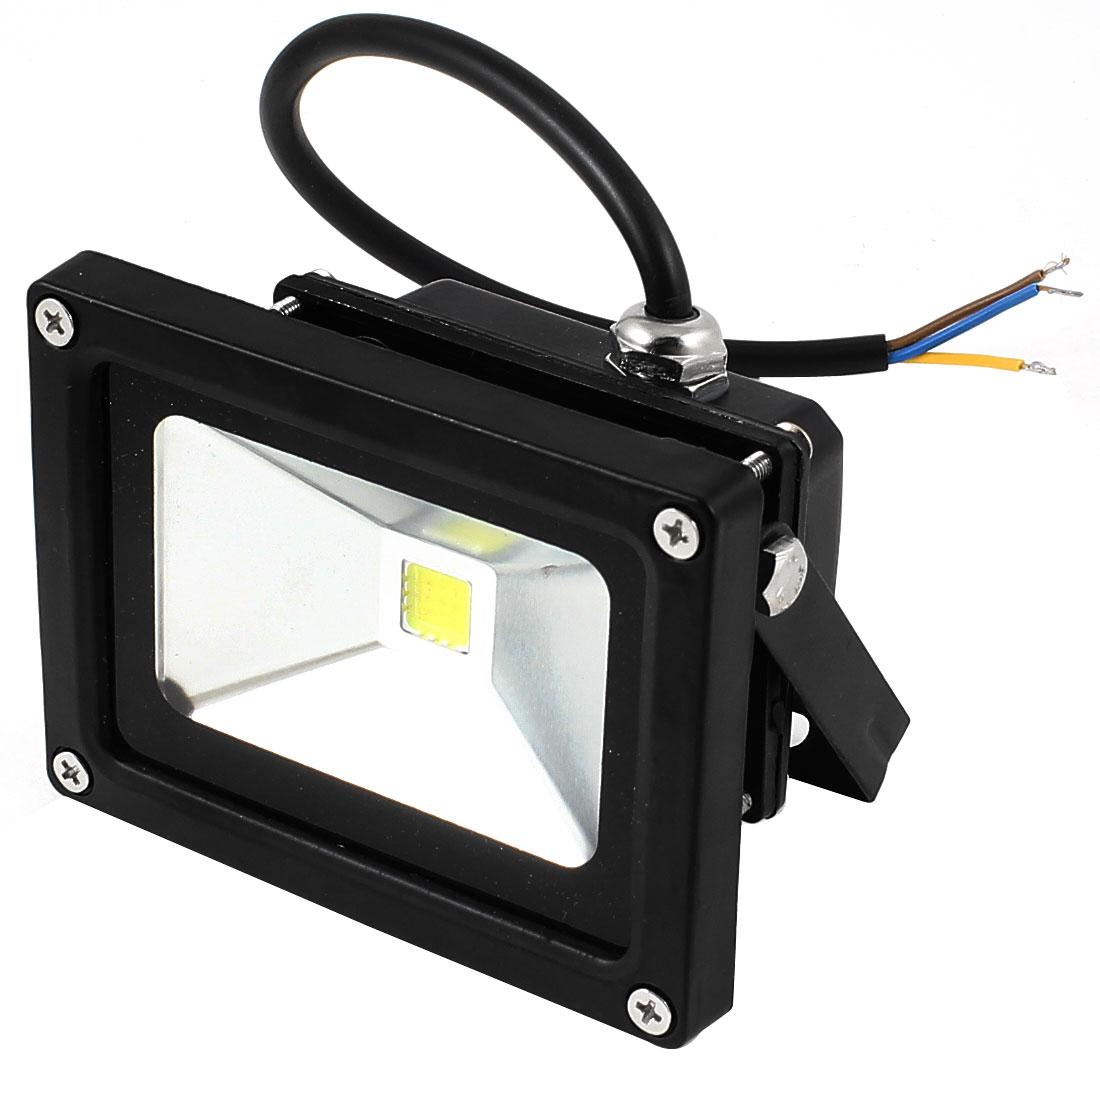 Black Retangle Metal Shell Car Lens Spot Light Spotlight Bulb White 220V 10W